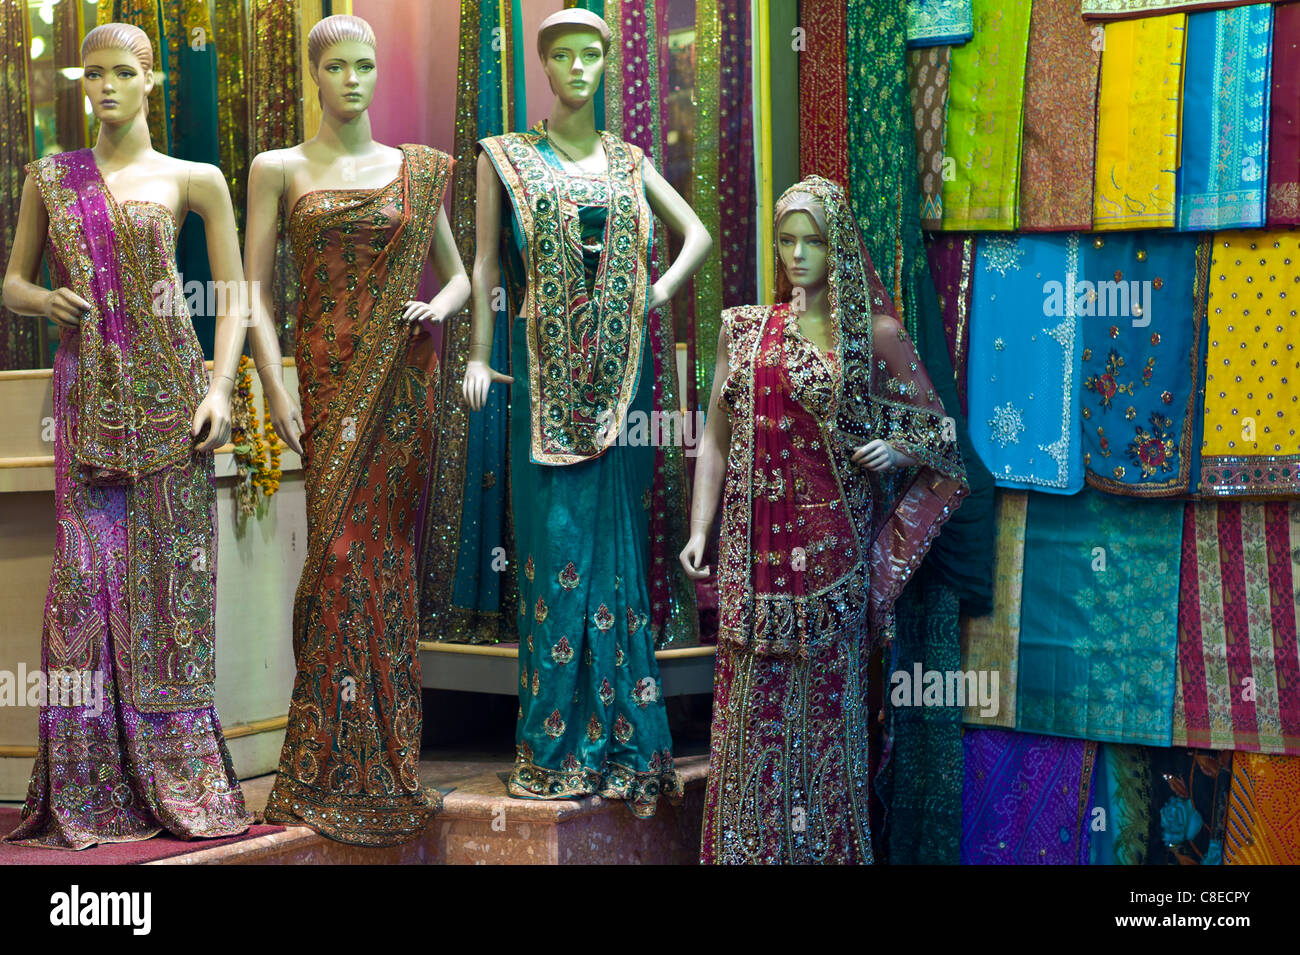 1ec5da99b6 Sari clothes shop in city of Varanasi, Benares, Northern India - Stock Image